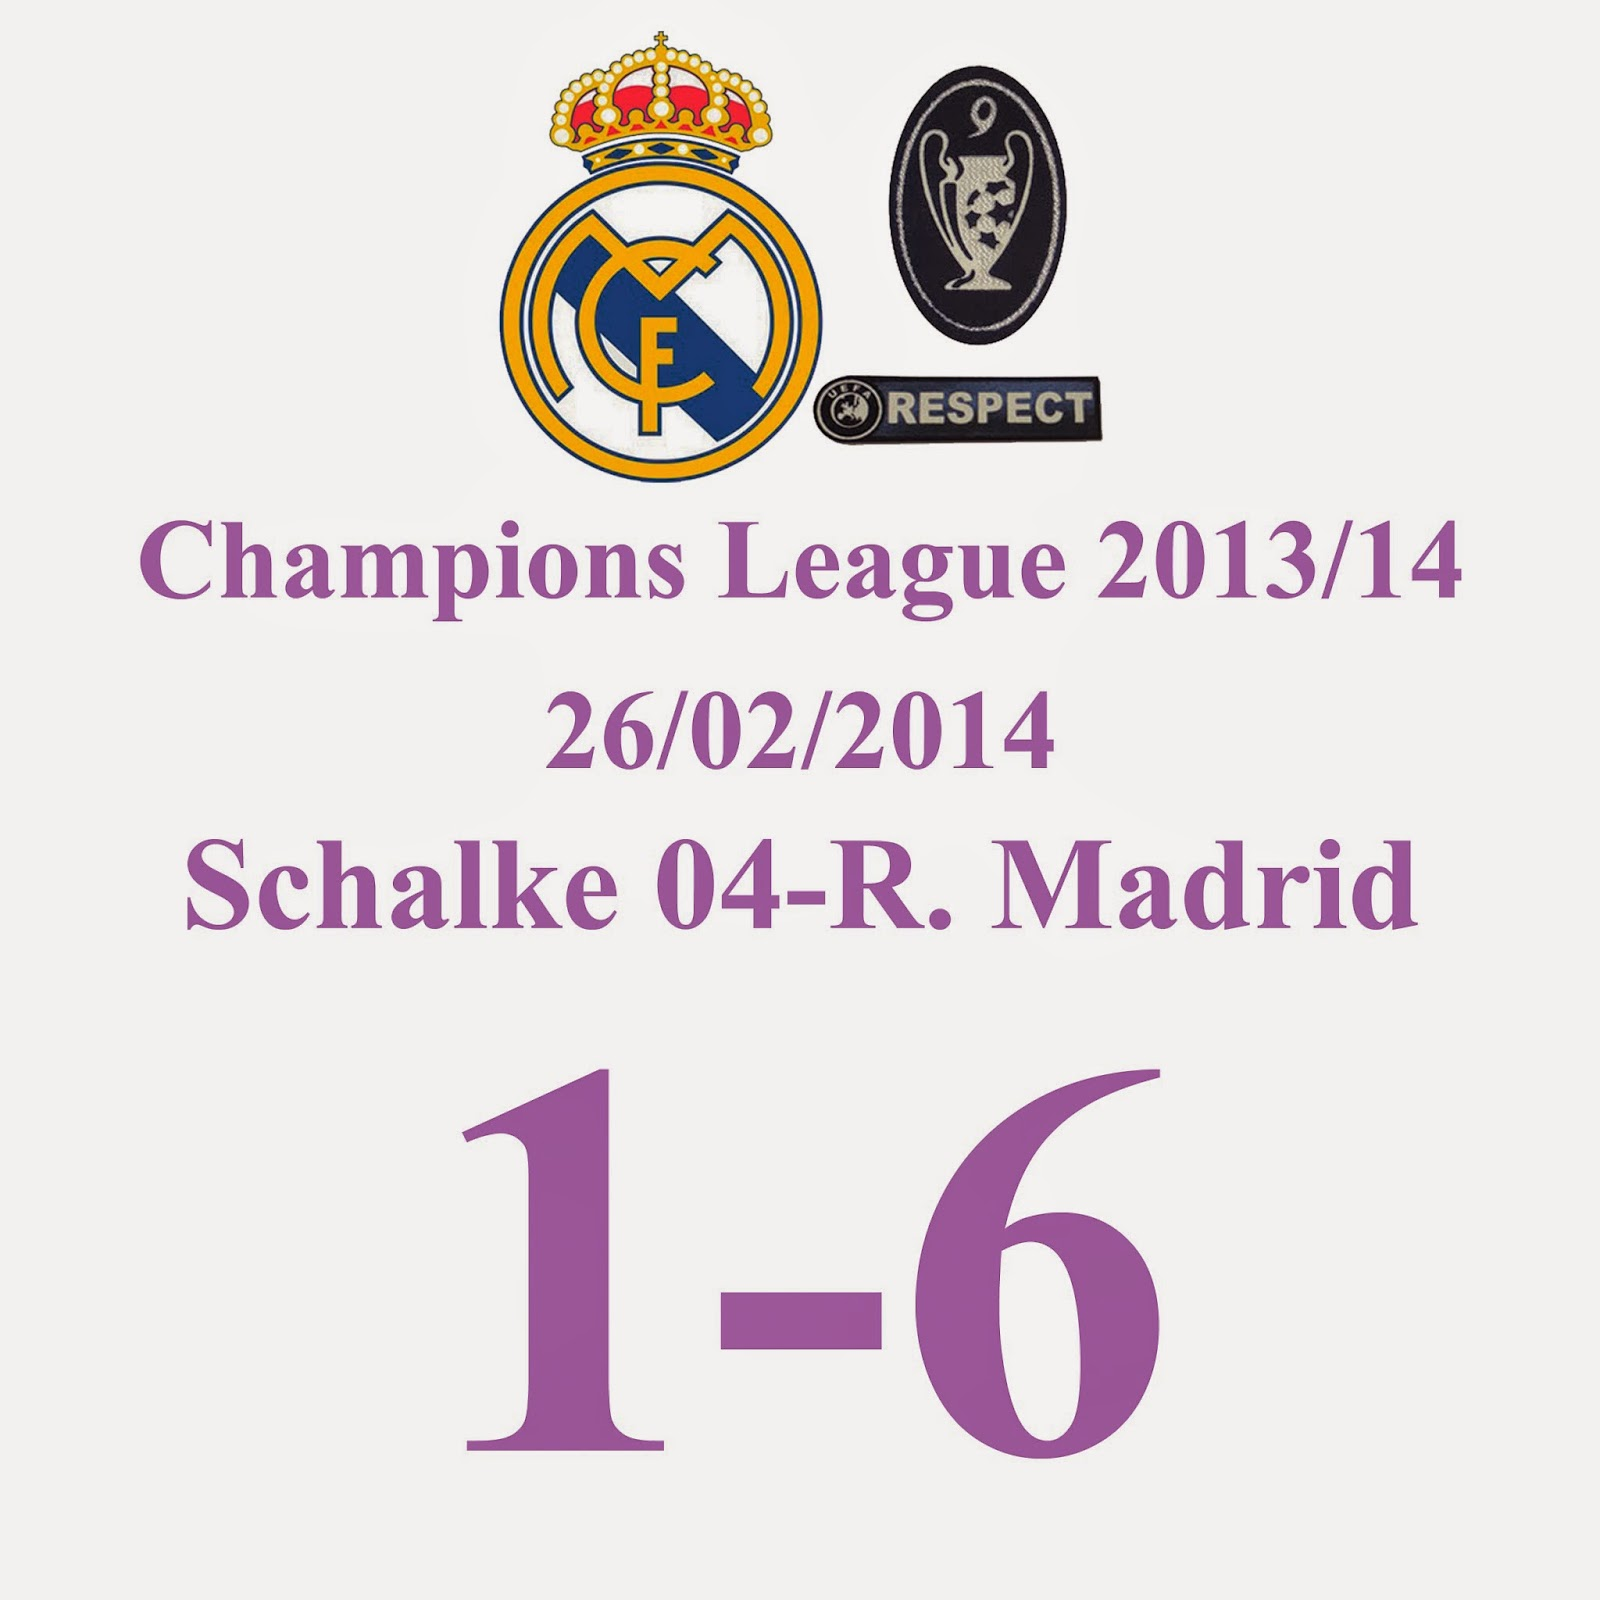 FC Schalke 04 1 - 6 Real Madrid - Octavos de final - 26/2/13 - Dobletes de K. Benzema, G. Bale y C. Ronaldo